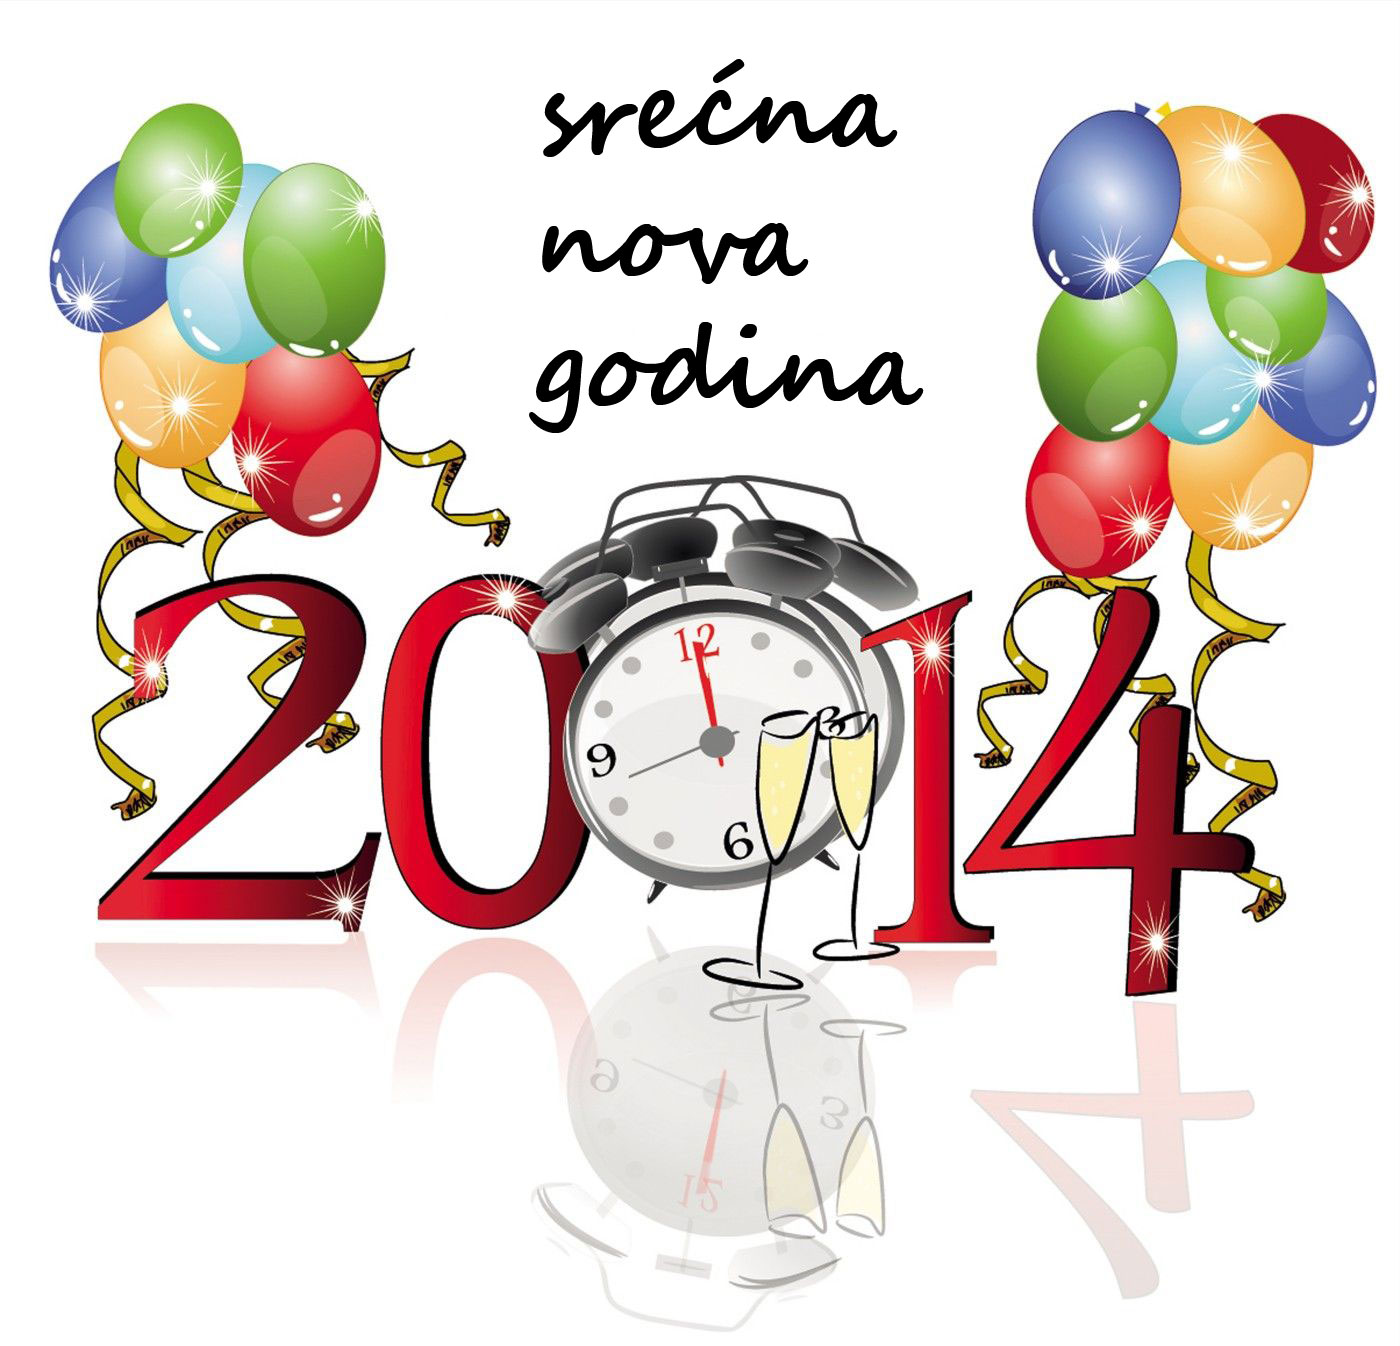 Srecna-Nova-2014-godina